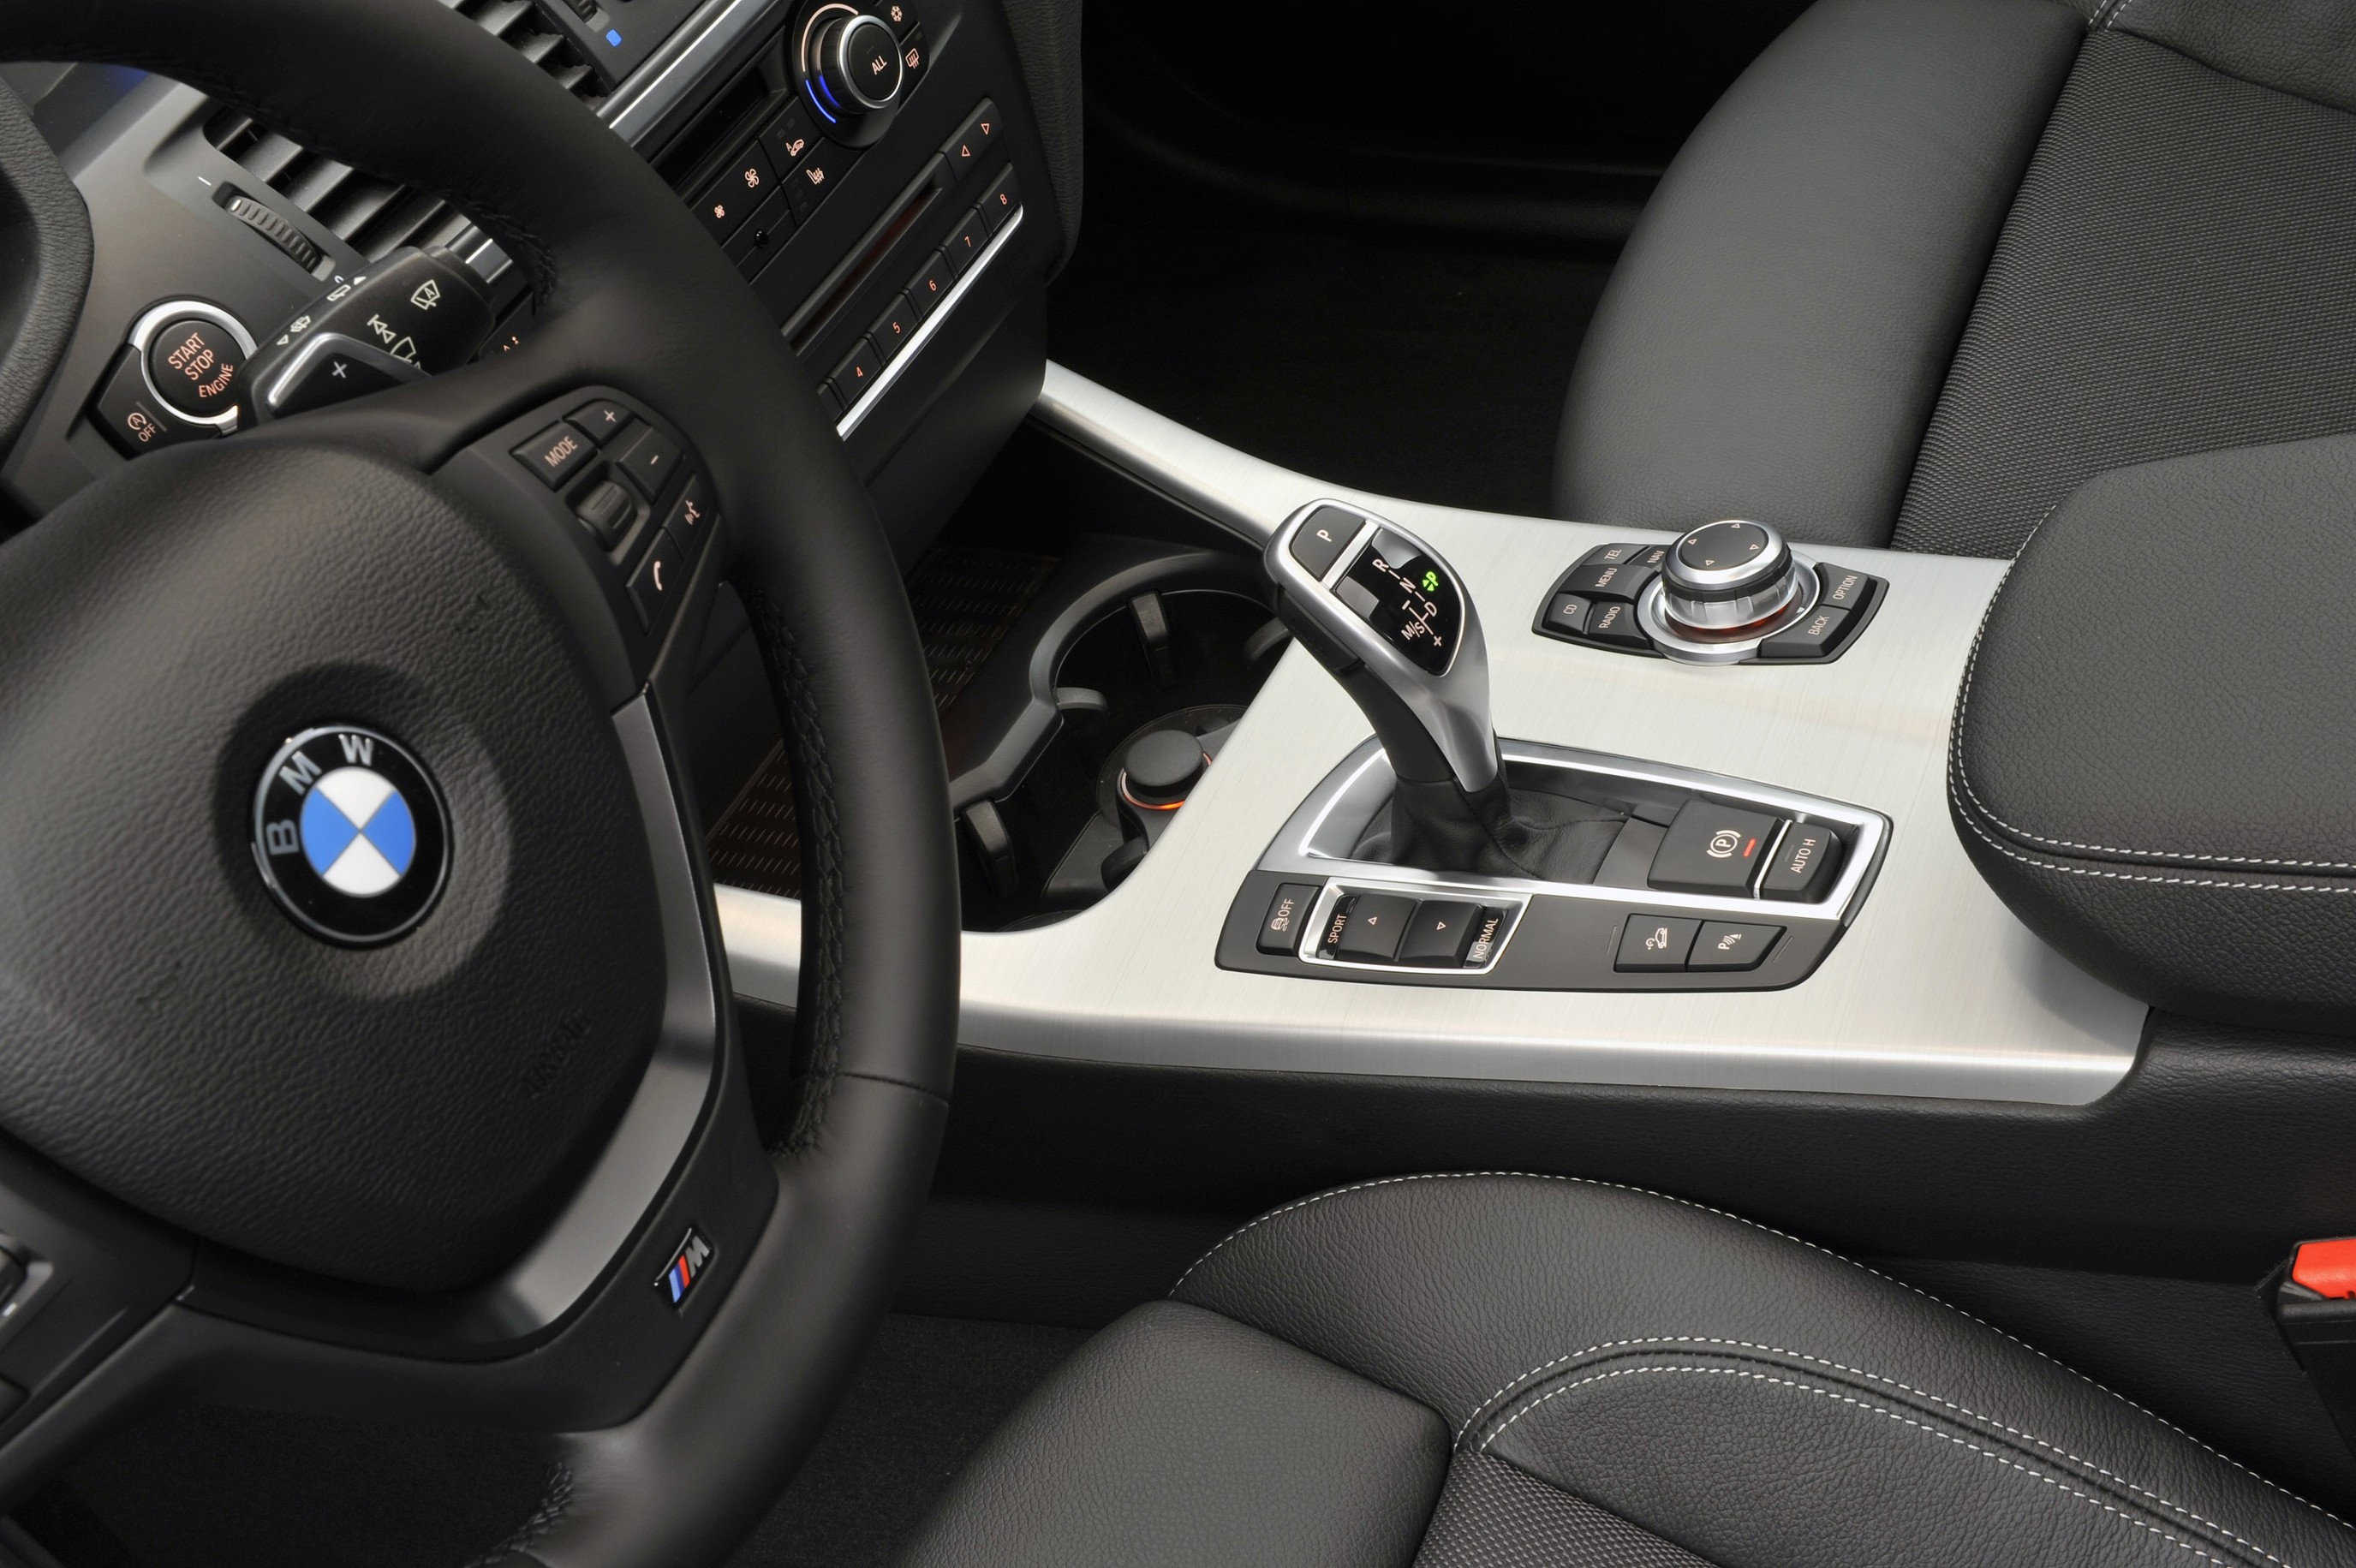 console centrale BMW X3 | {Car} | Pinterest | Bmw x3, BMW and Cars